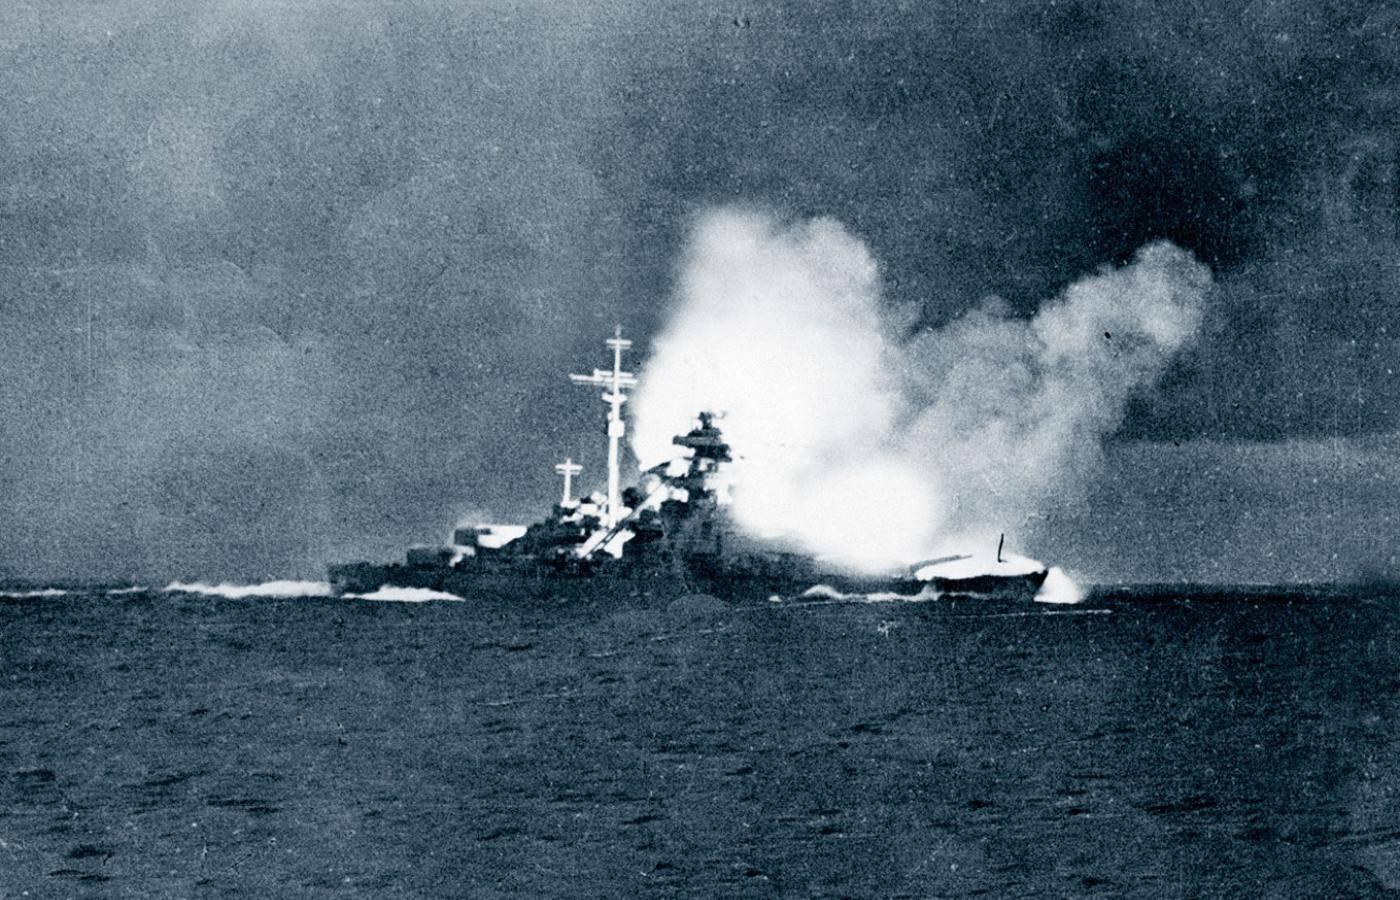 Немецкий линкор тирпиц -german battleship tirpitz